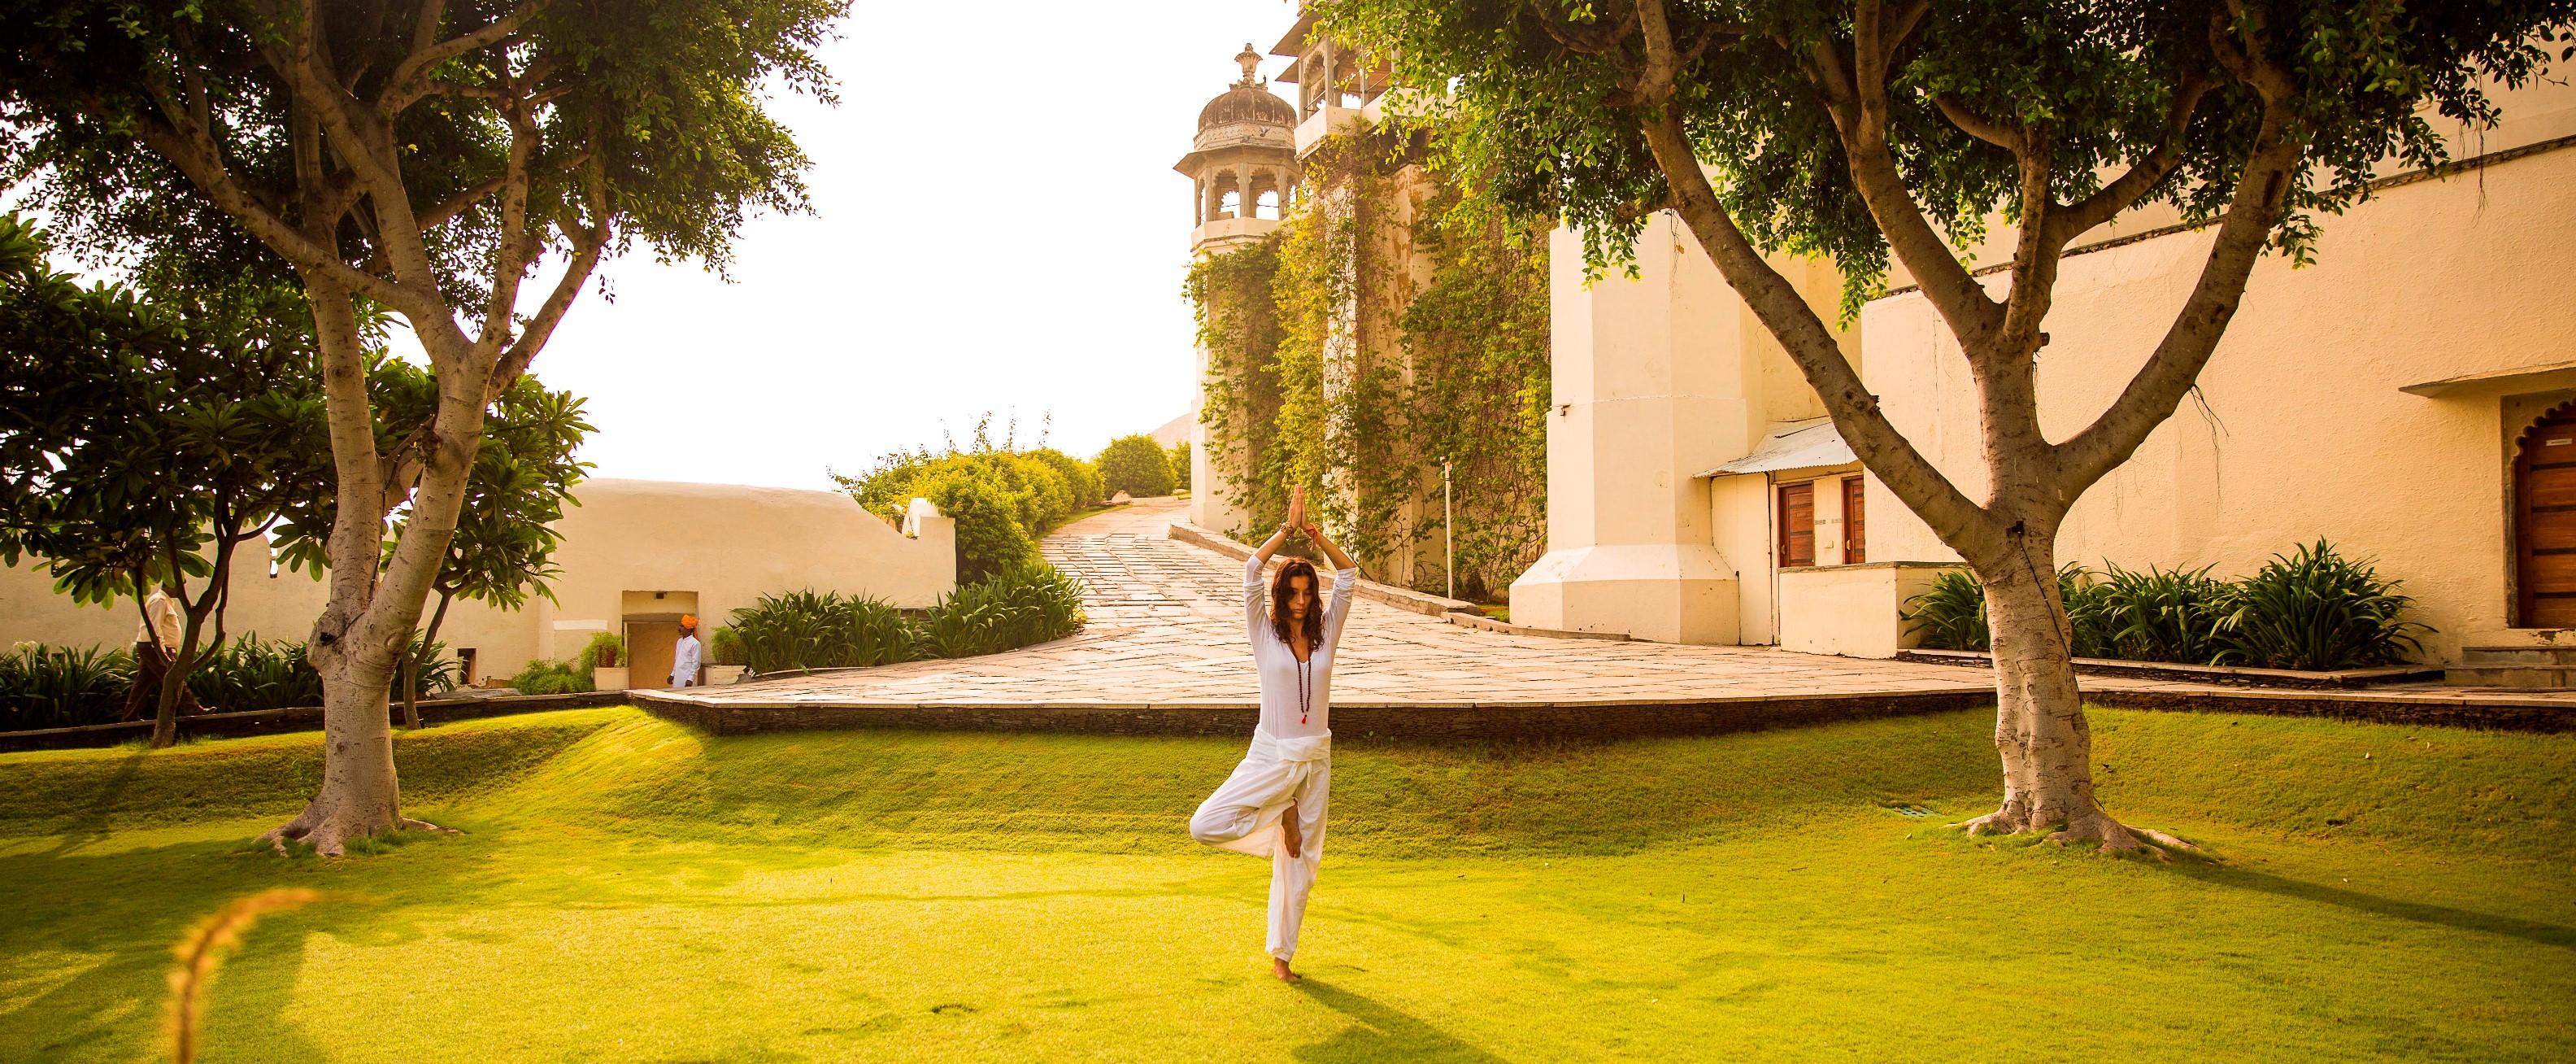 raas-devigarh-rajasthan-yoga